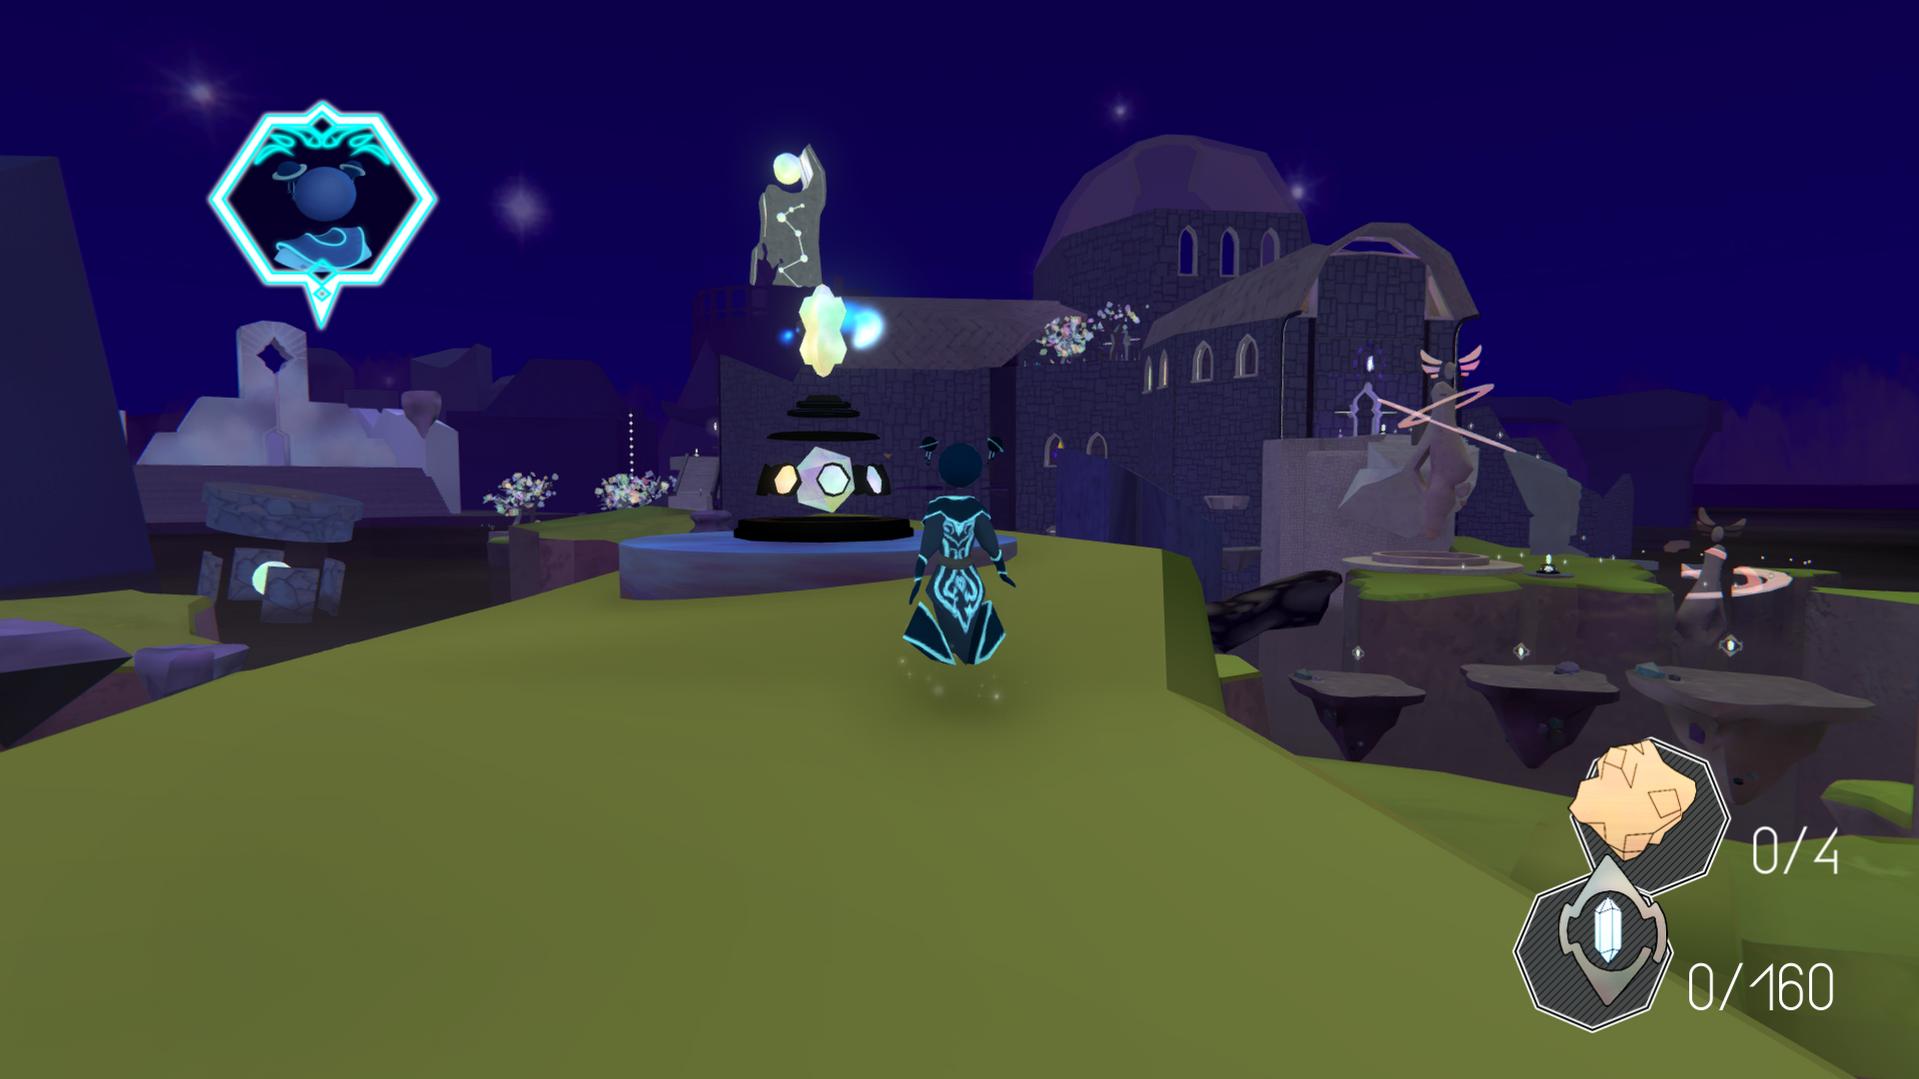 The Celestial Citadel